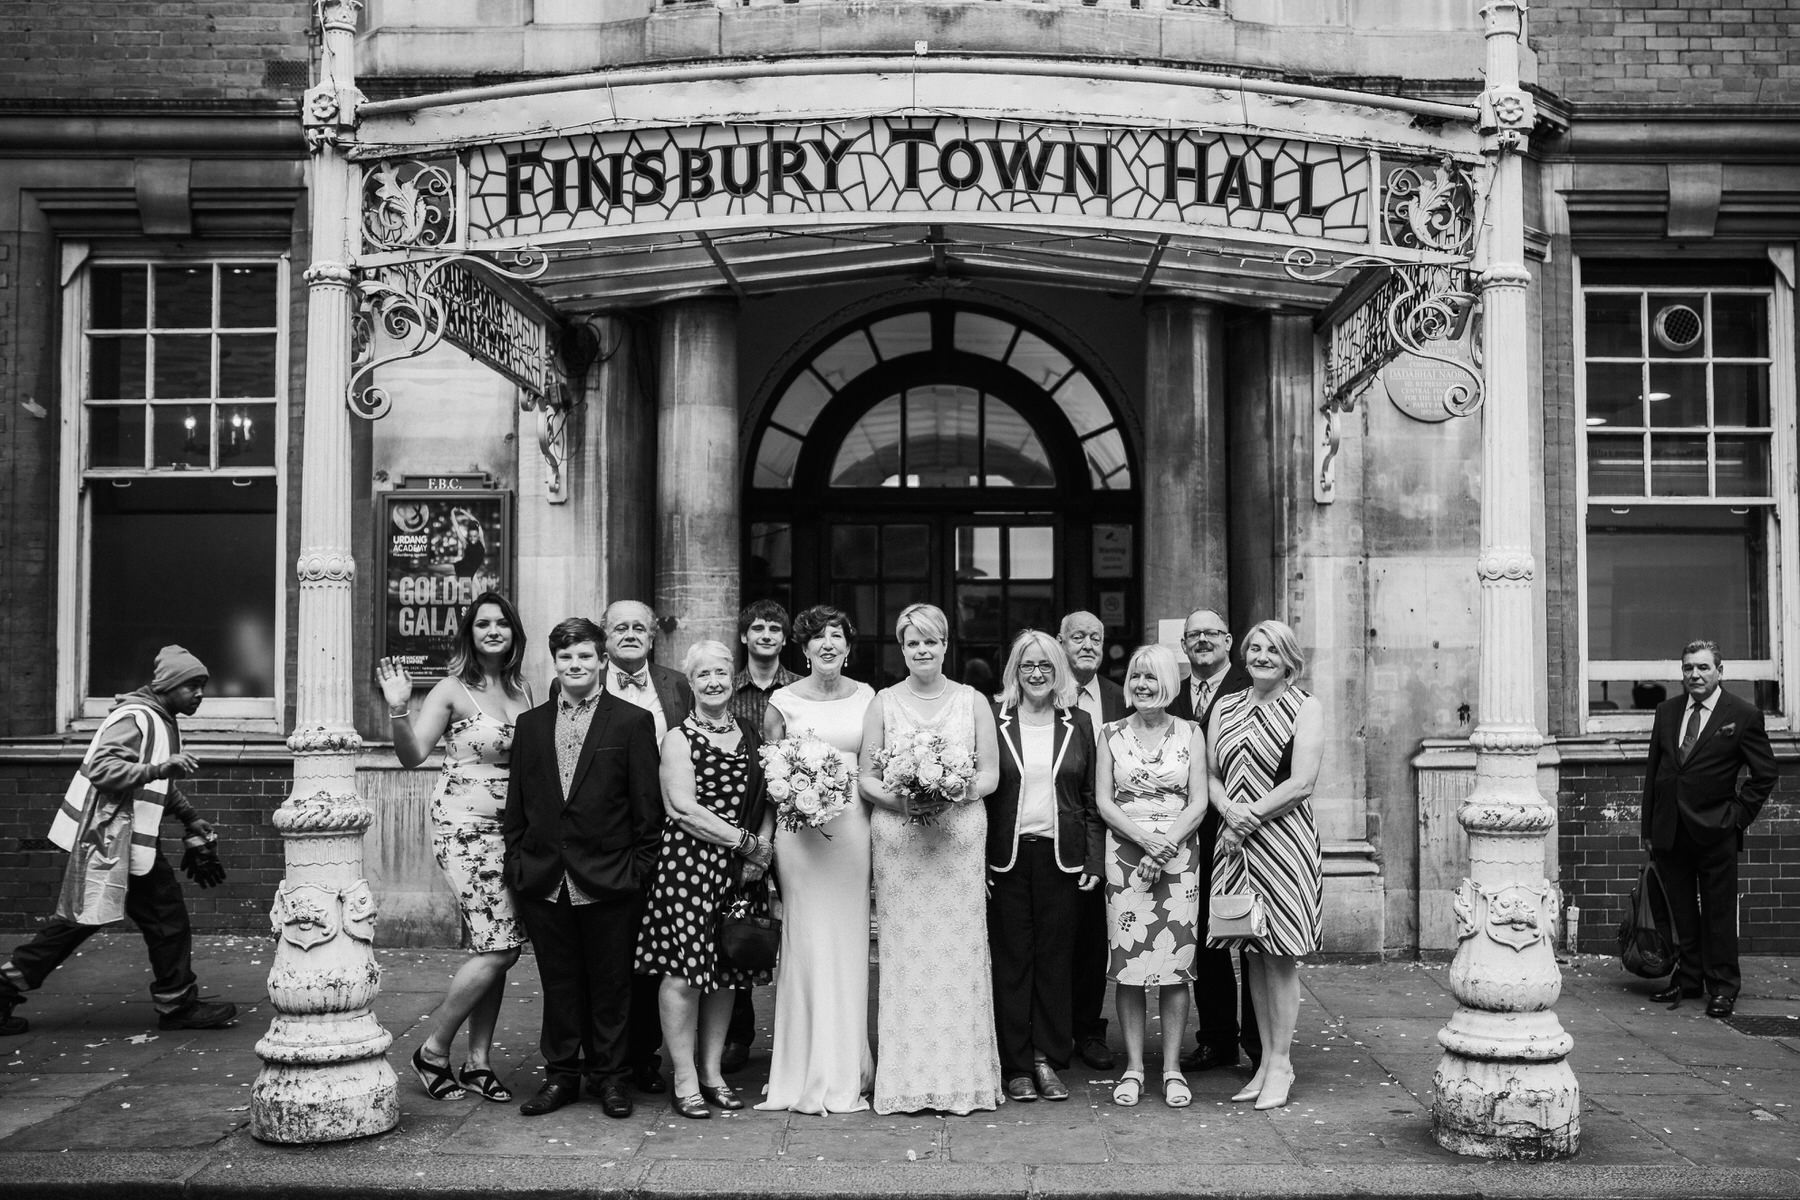 140 Finsbury Town Hall group photo reportage wedding.jpg